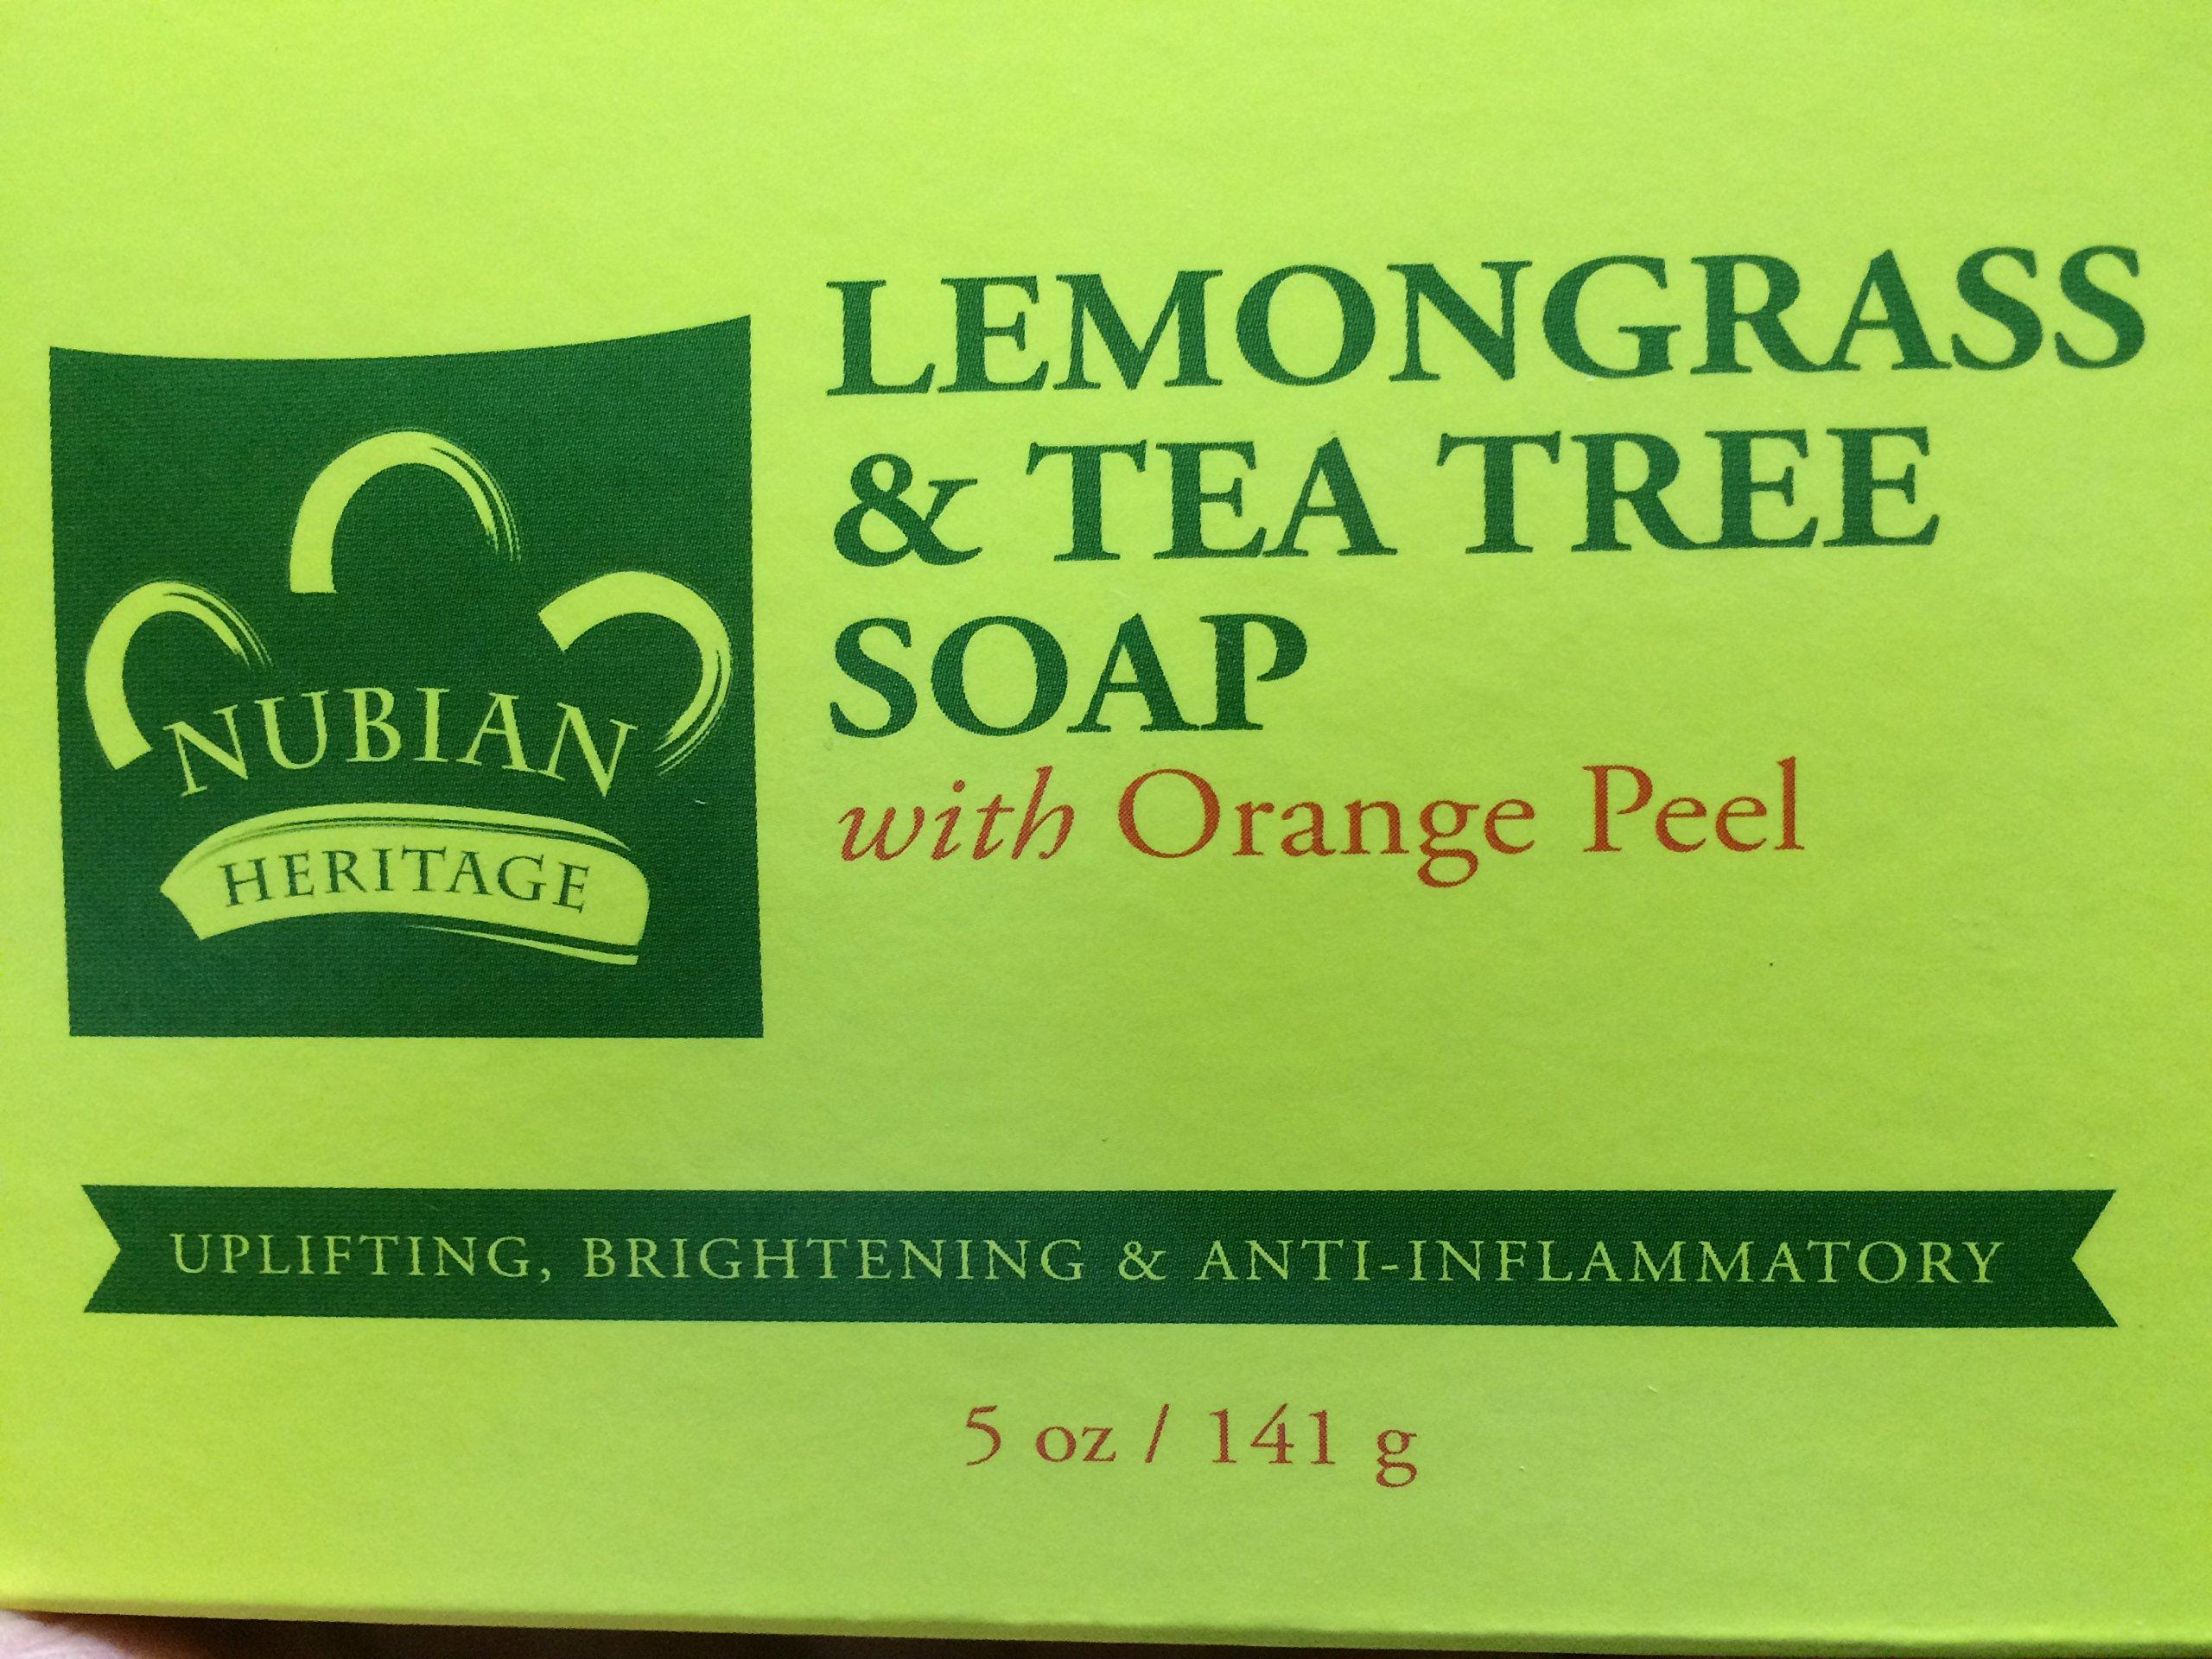 Lemongrass & Tea Tree Soap with Orange Peel 5 oz. (72) Bars by NUBIAN HERITAGE